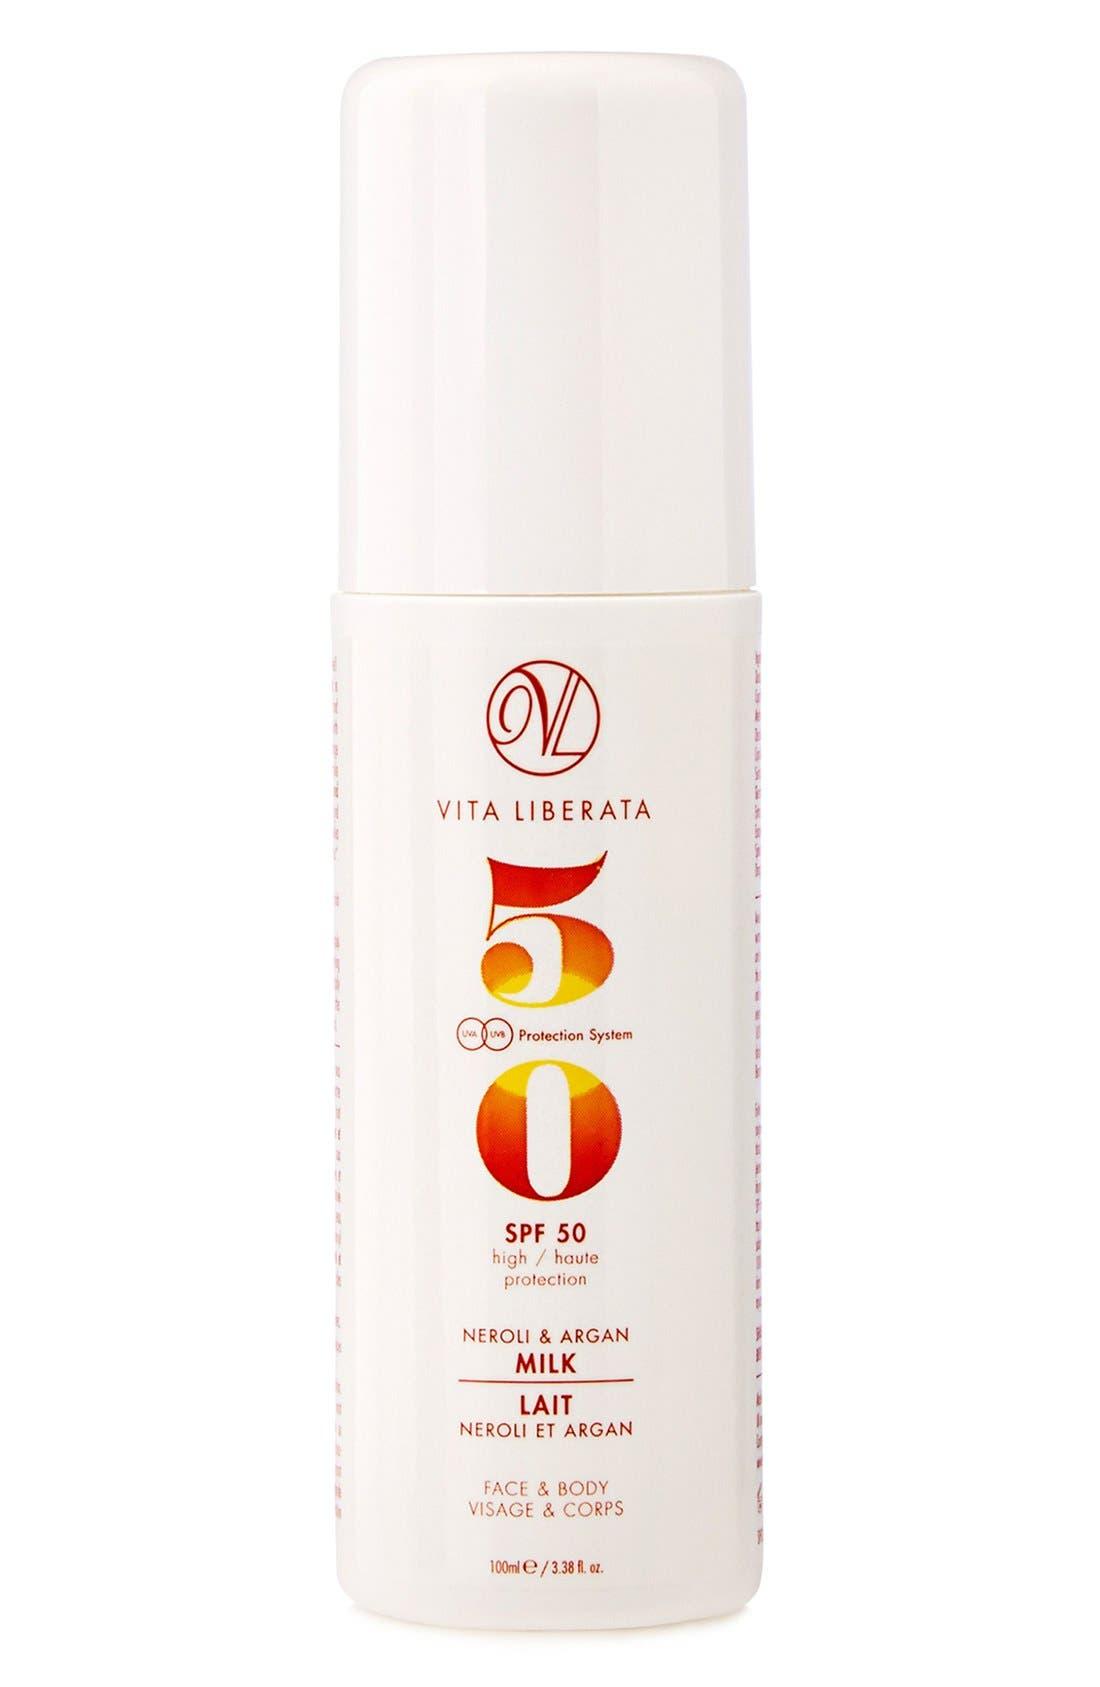 Neroli & Argan Milk for Face & Body SPF 50,                             Main thumbnail 1, color,